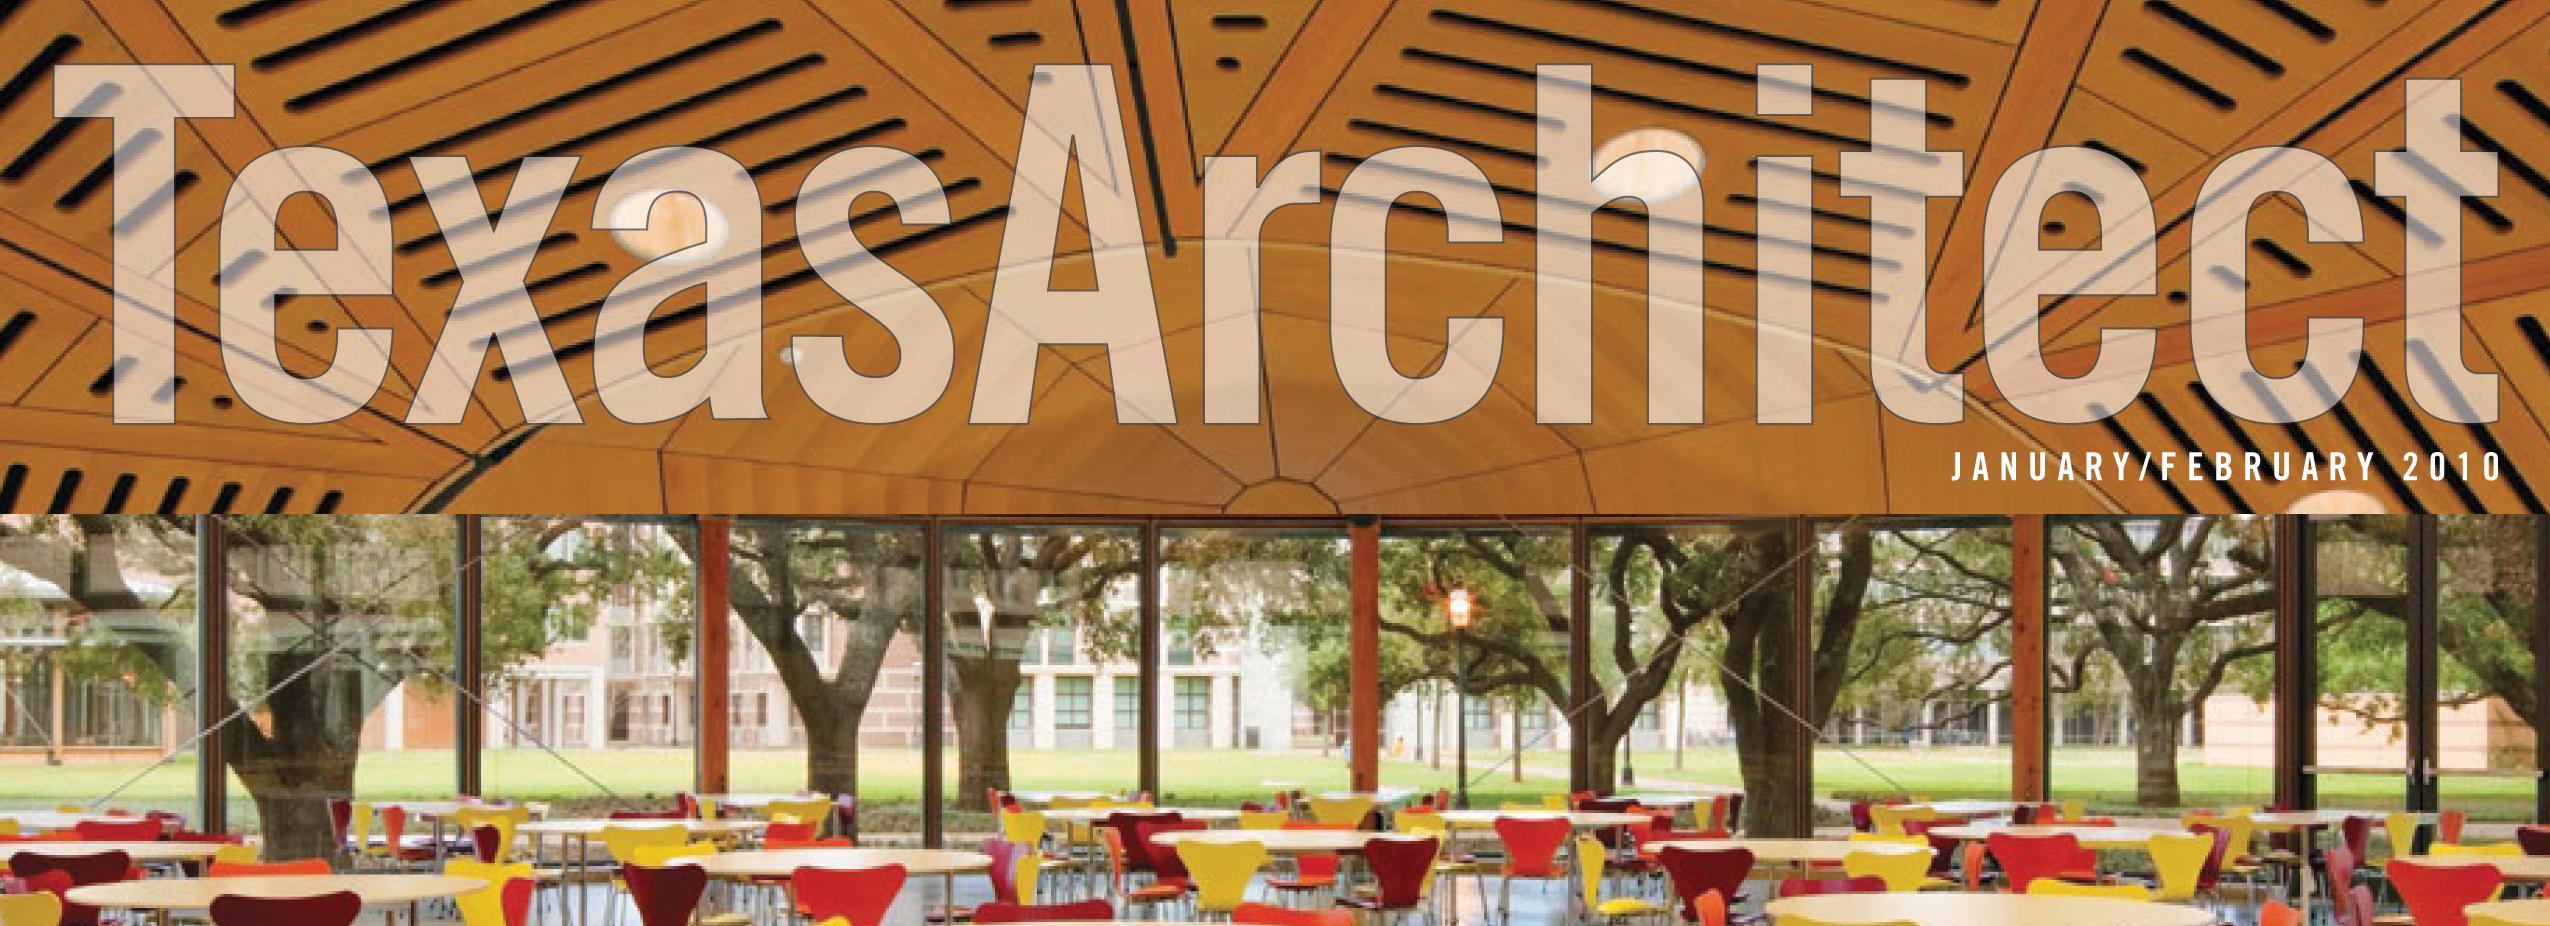 Rice-University-Texas-Architect-1-Slider1